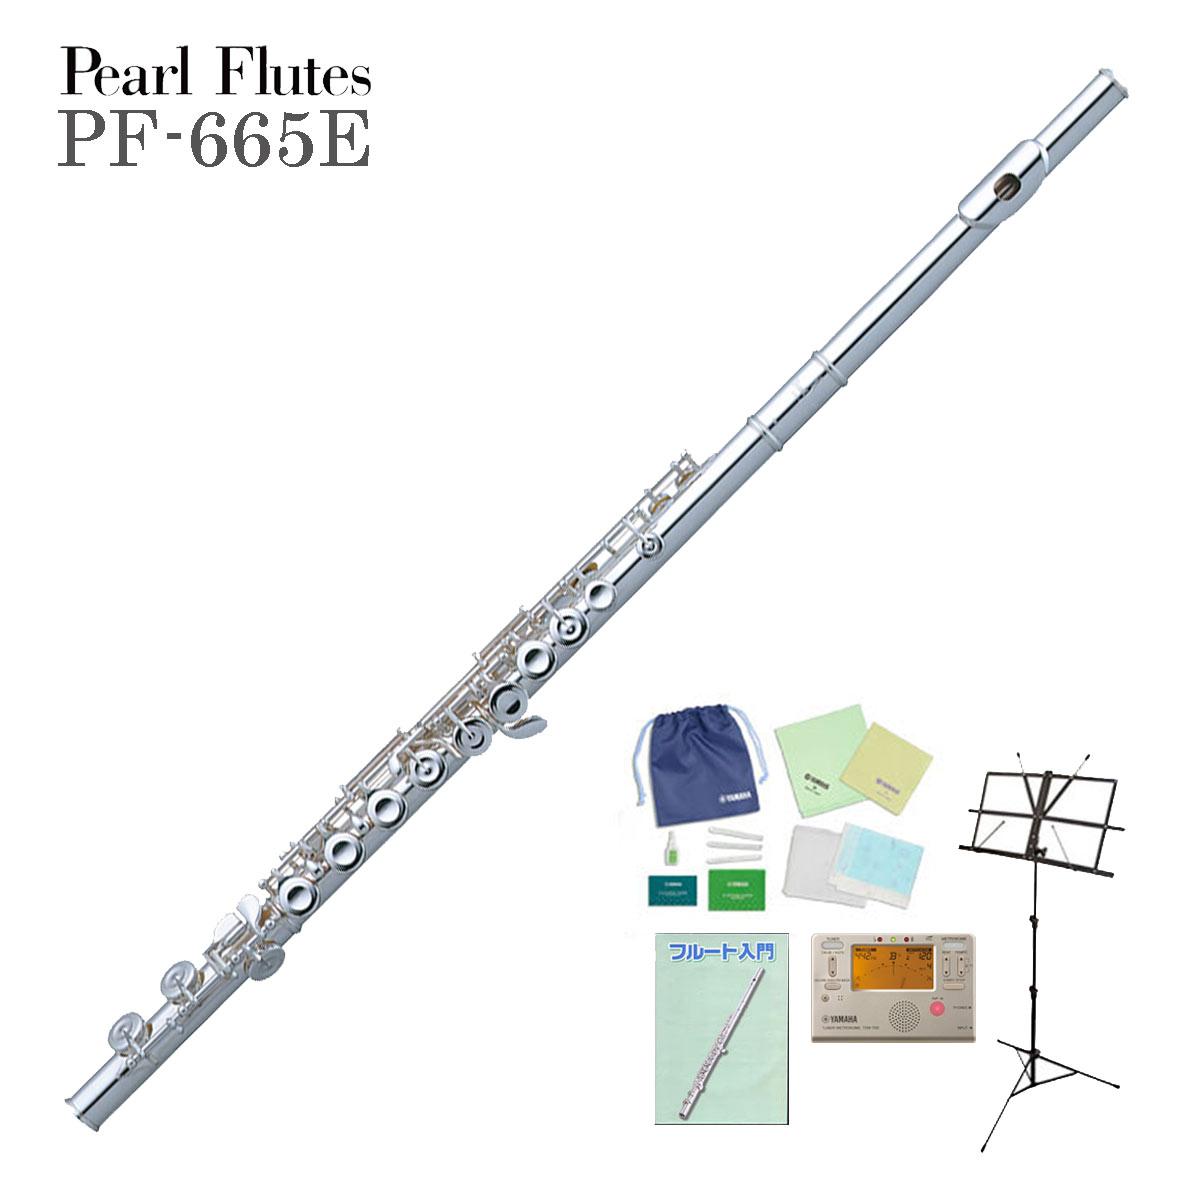 Pearl / PF-665E パール フルート PF665E ドルチェ PF665E 頭部管銀製 《未展示保管の新品をお届け》【お取り寄せ】【全部入りセット】《SPRING FAIR:811163200》